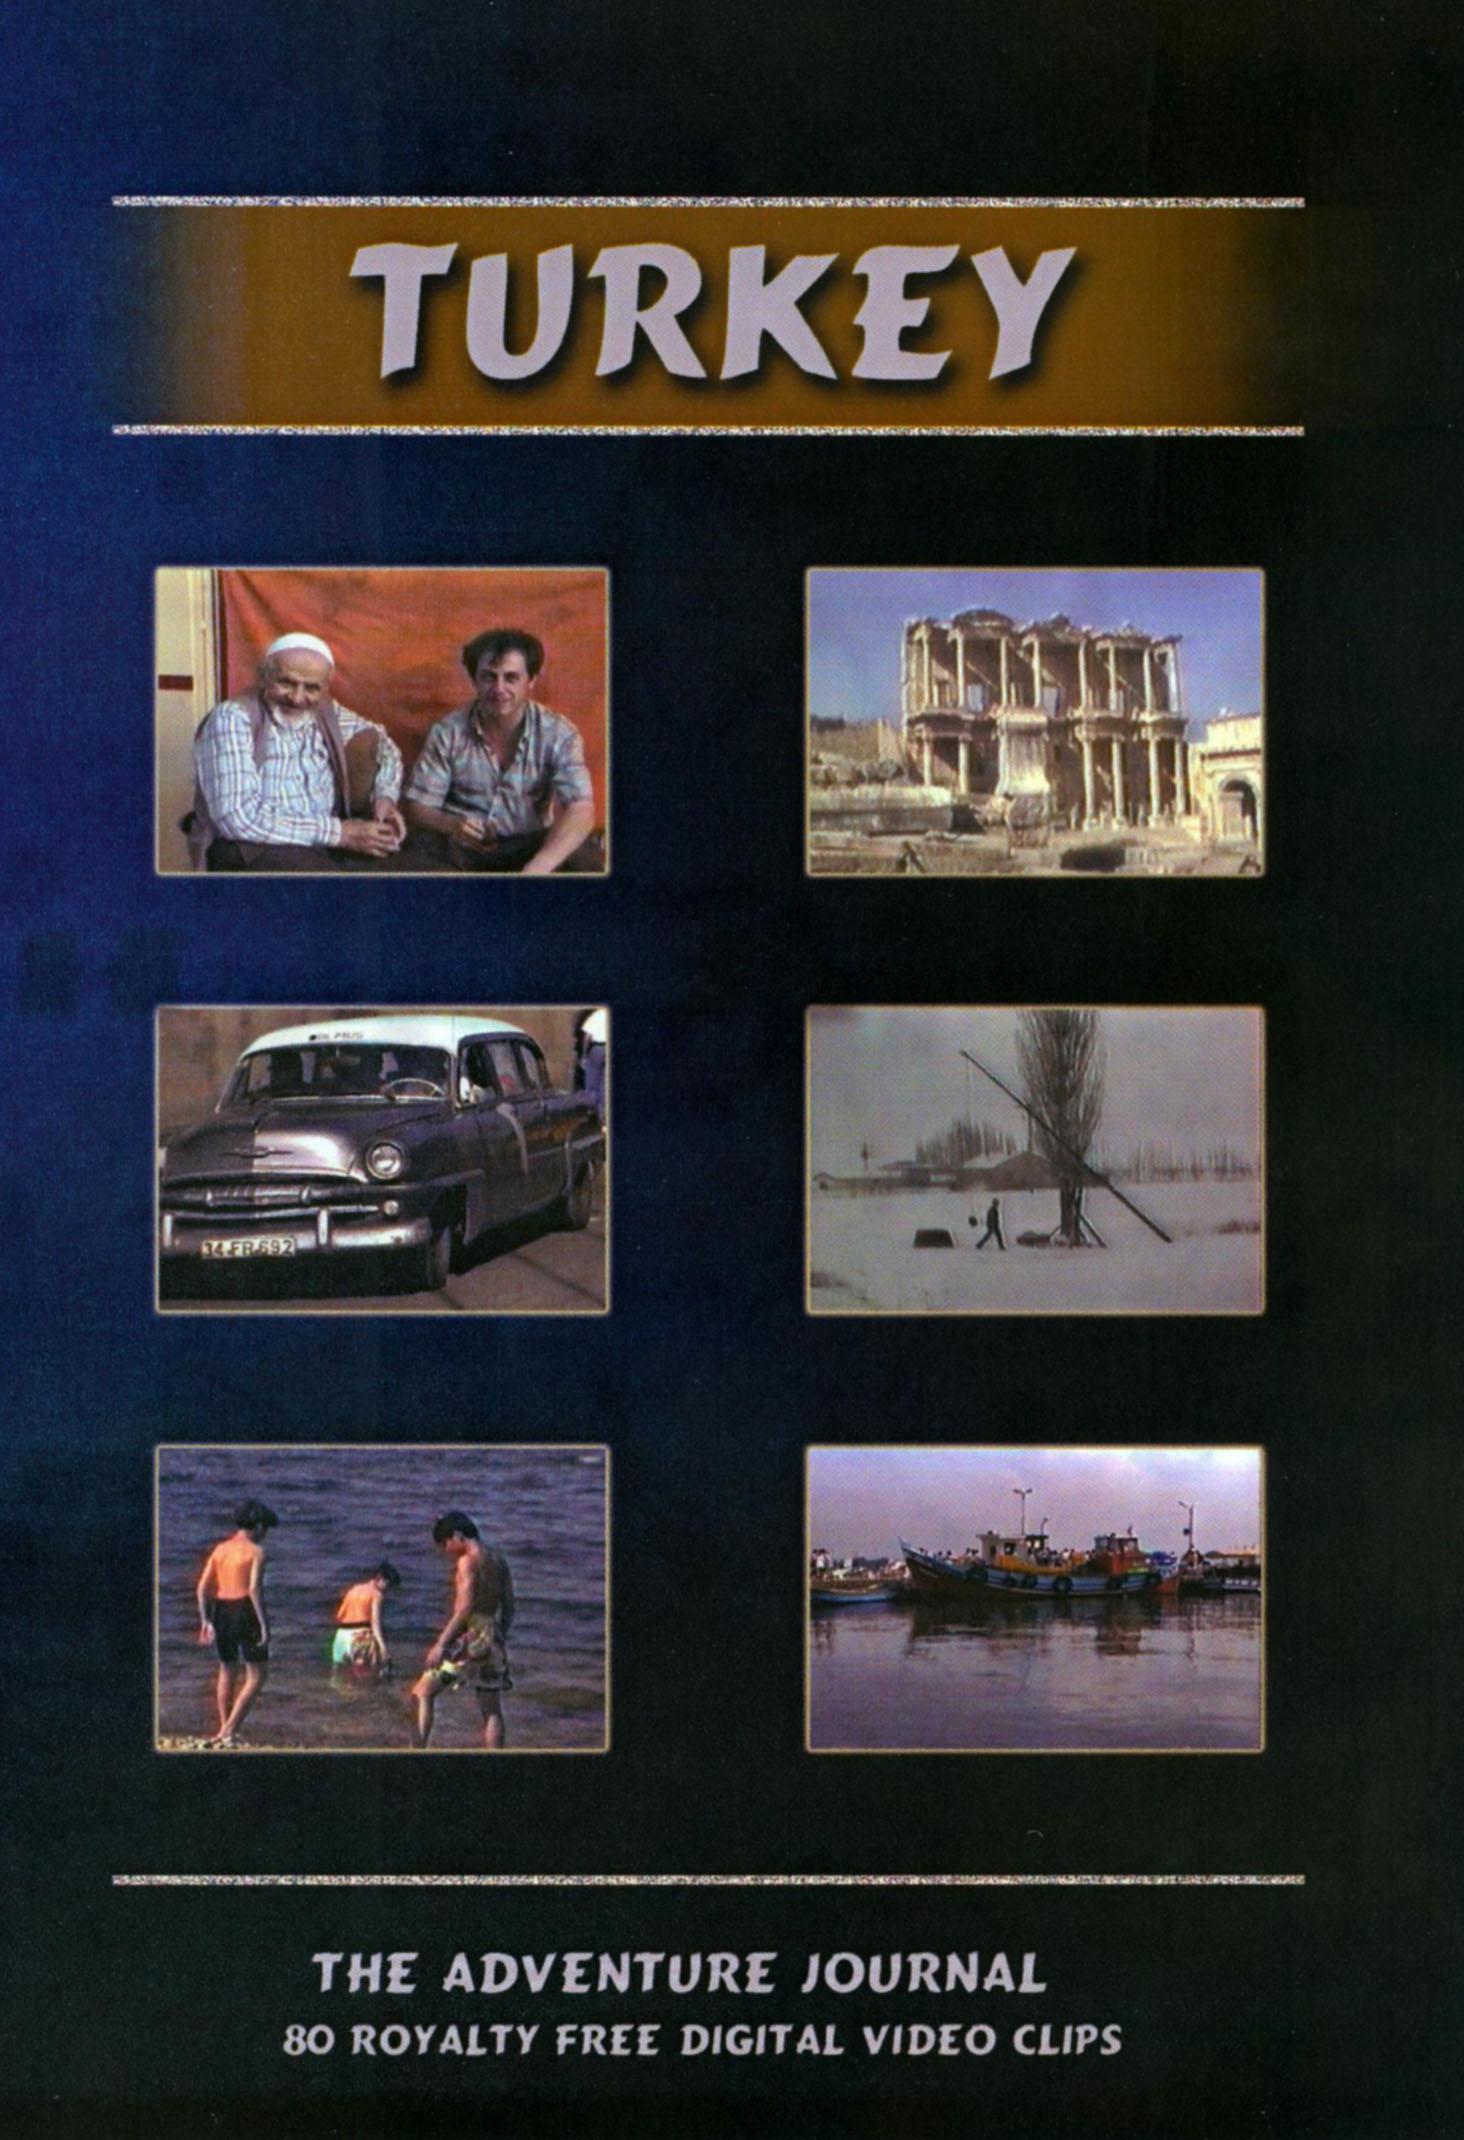 Turkey: The Adventure Journal - 80 Royalty Free Digital Video Clips